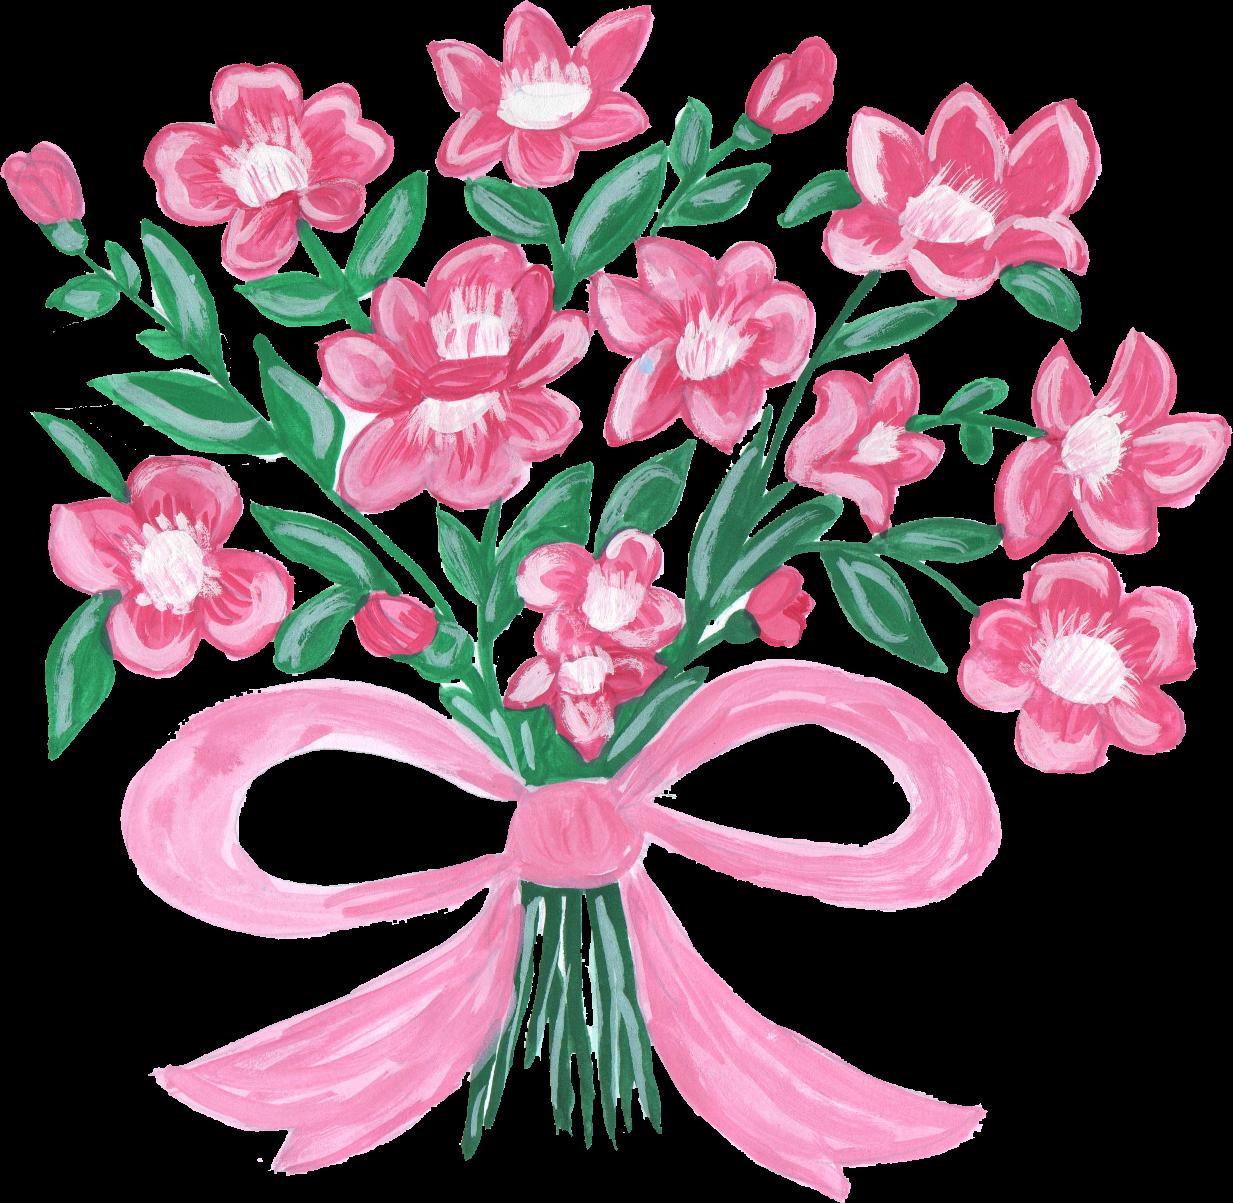 Free download flower bouquets svg 10 Flower Bouquet (PNG Transparent)   OnlyGFX.com svg